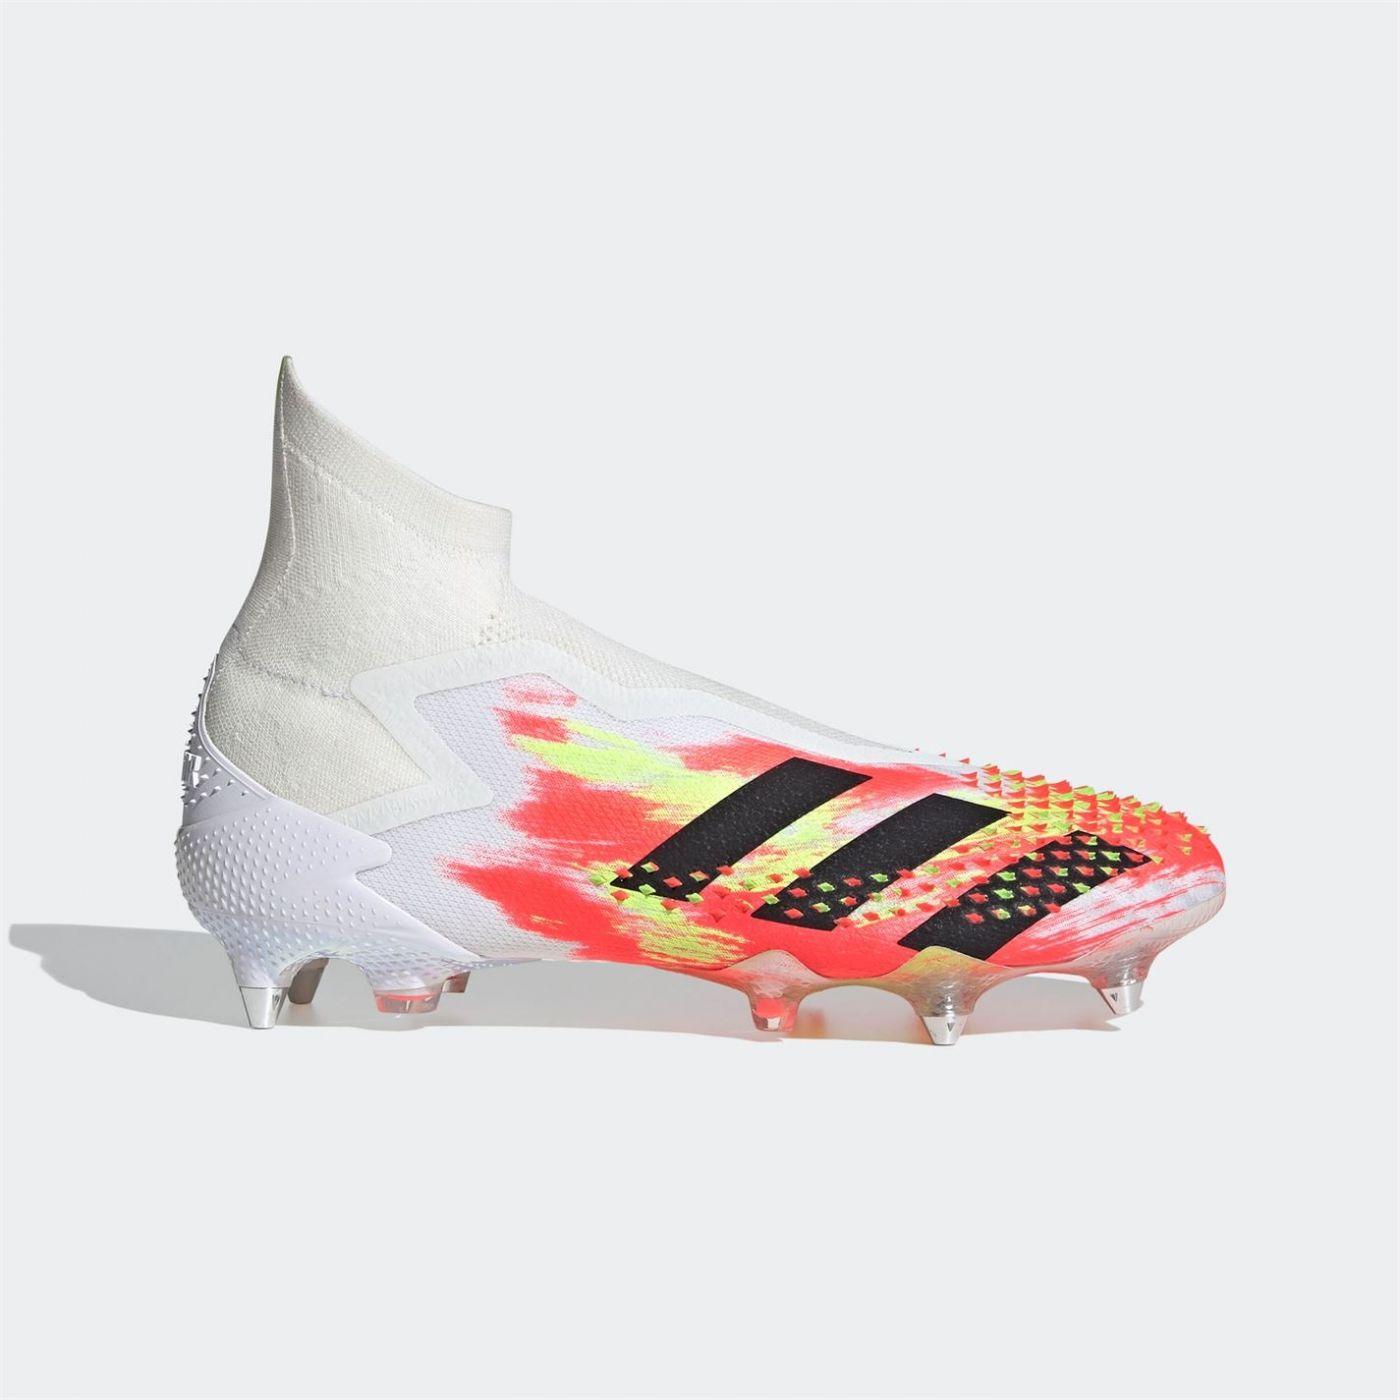 Adidas Predator 20 Plus SG Football Boots